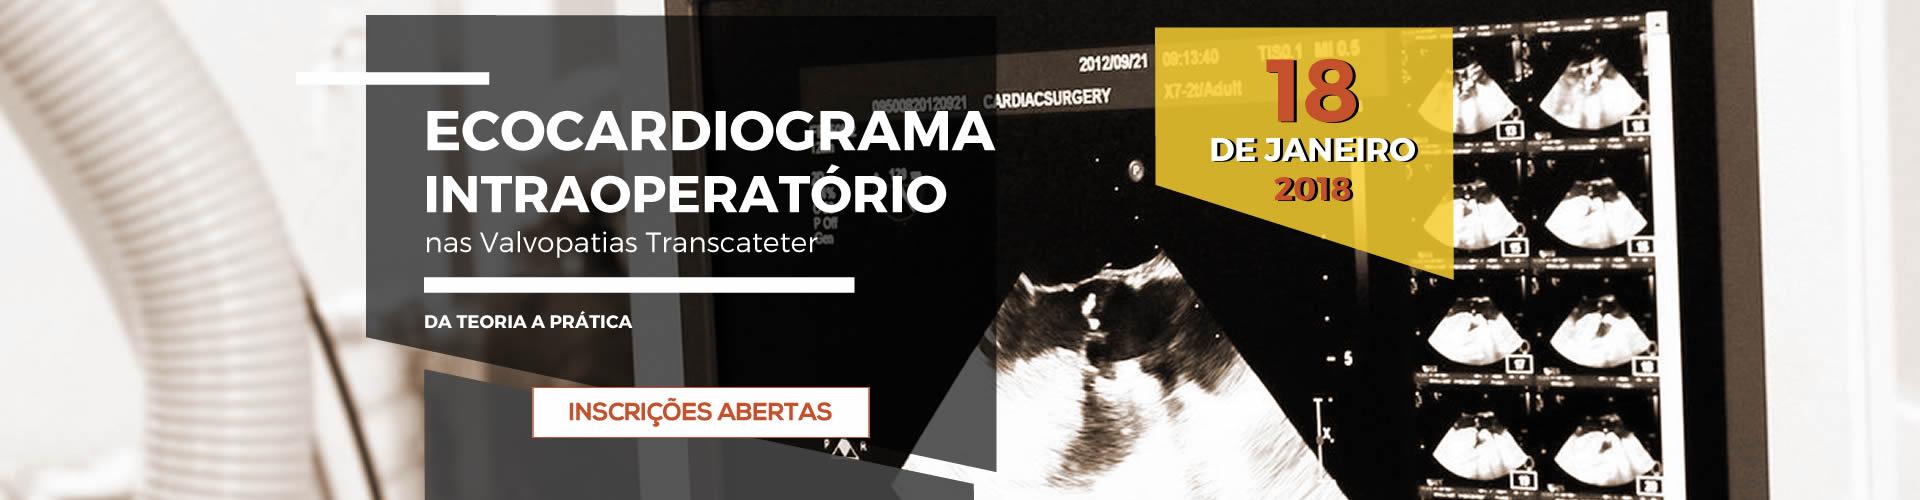 slide-ecocardiograma